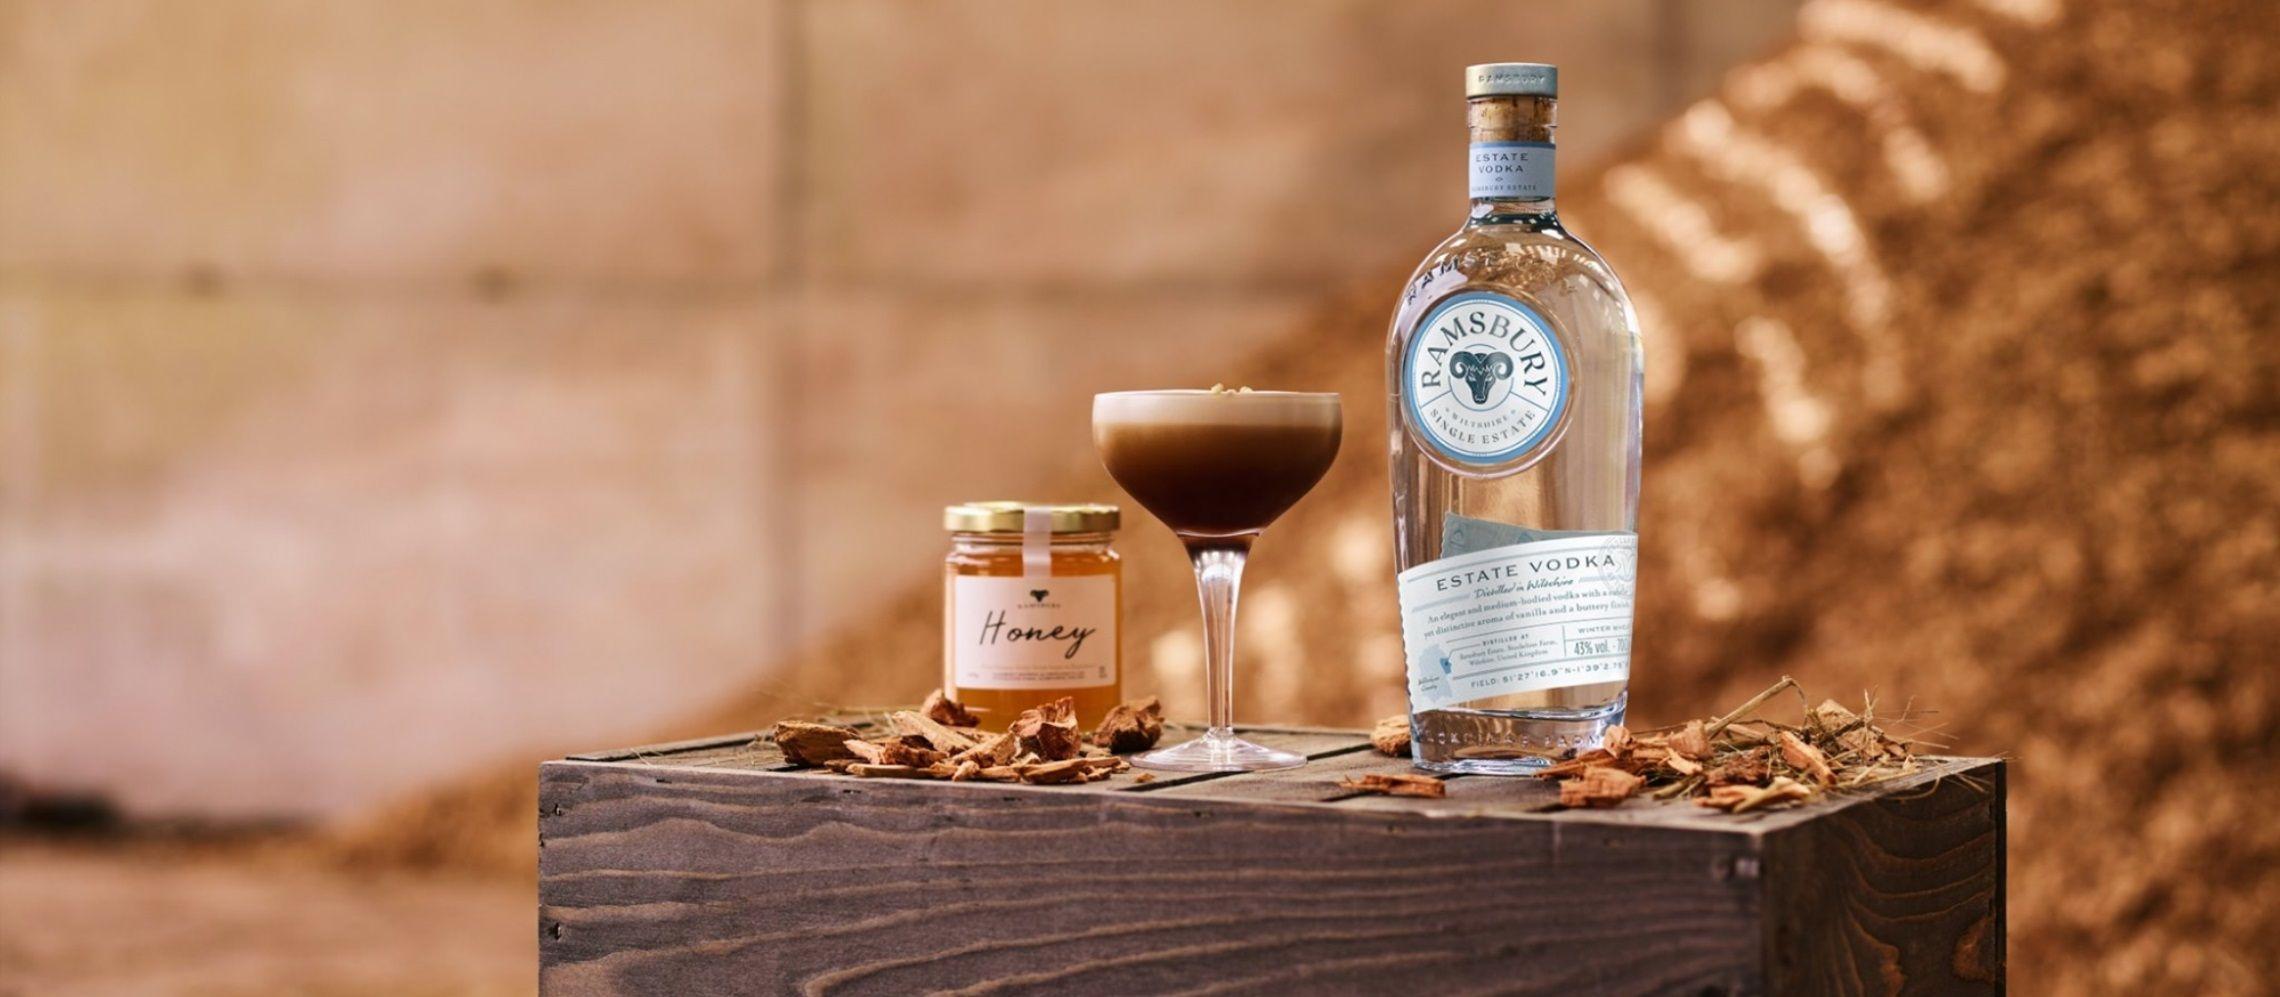 Photo for: Ramsbury Single Estate Vodka Wins Spirits Of The Year Award